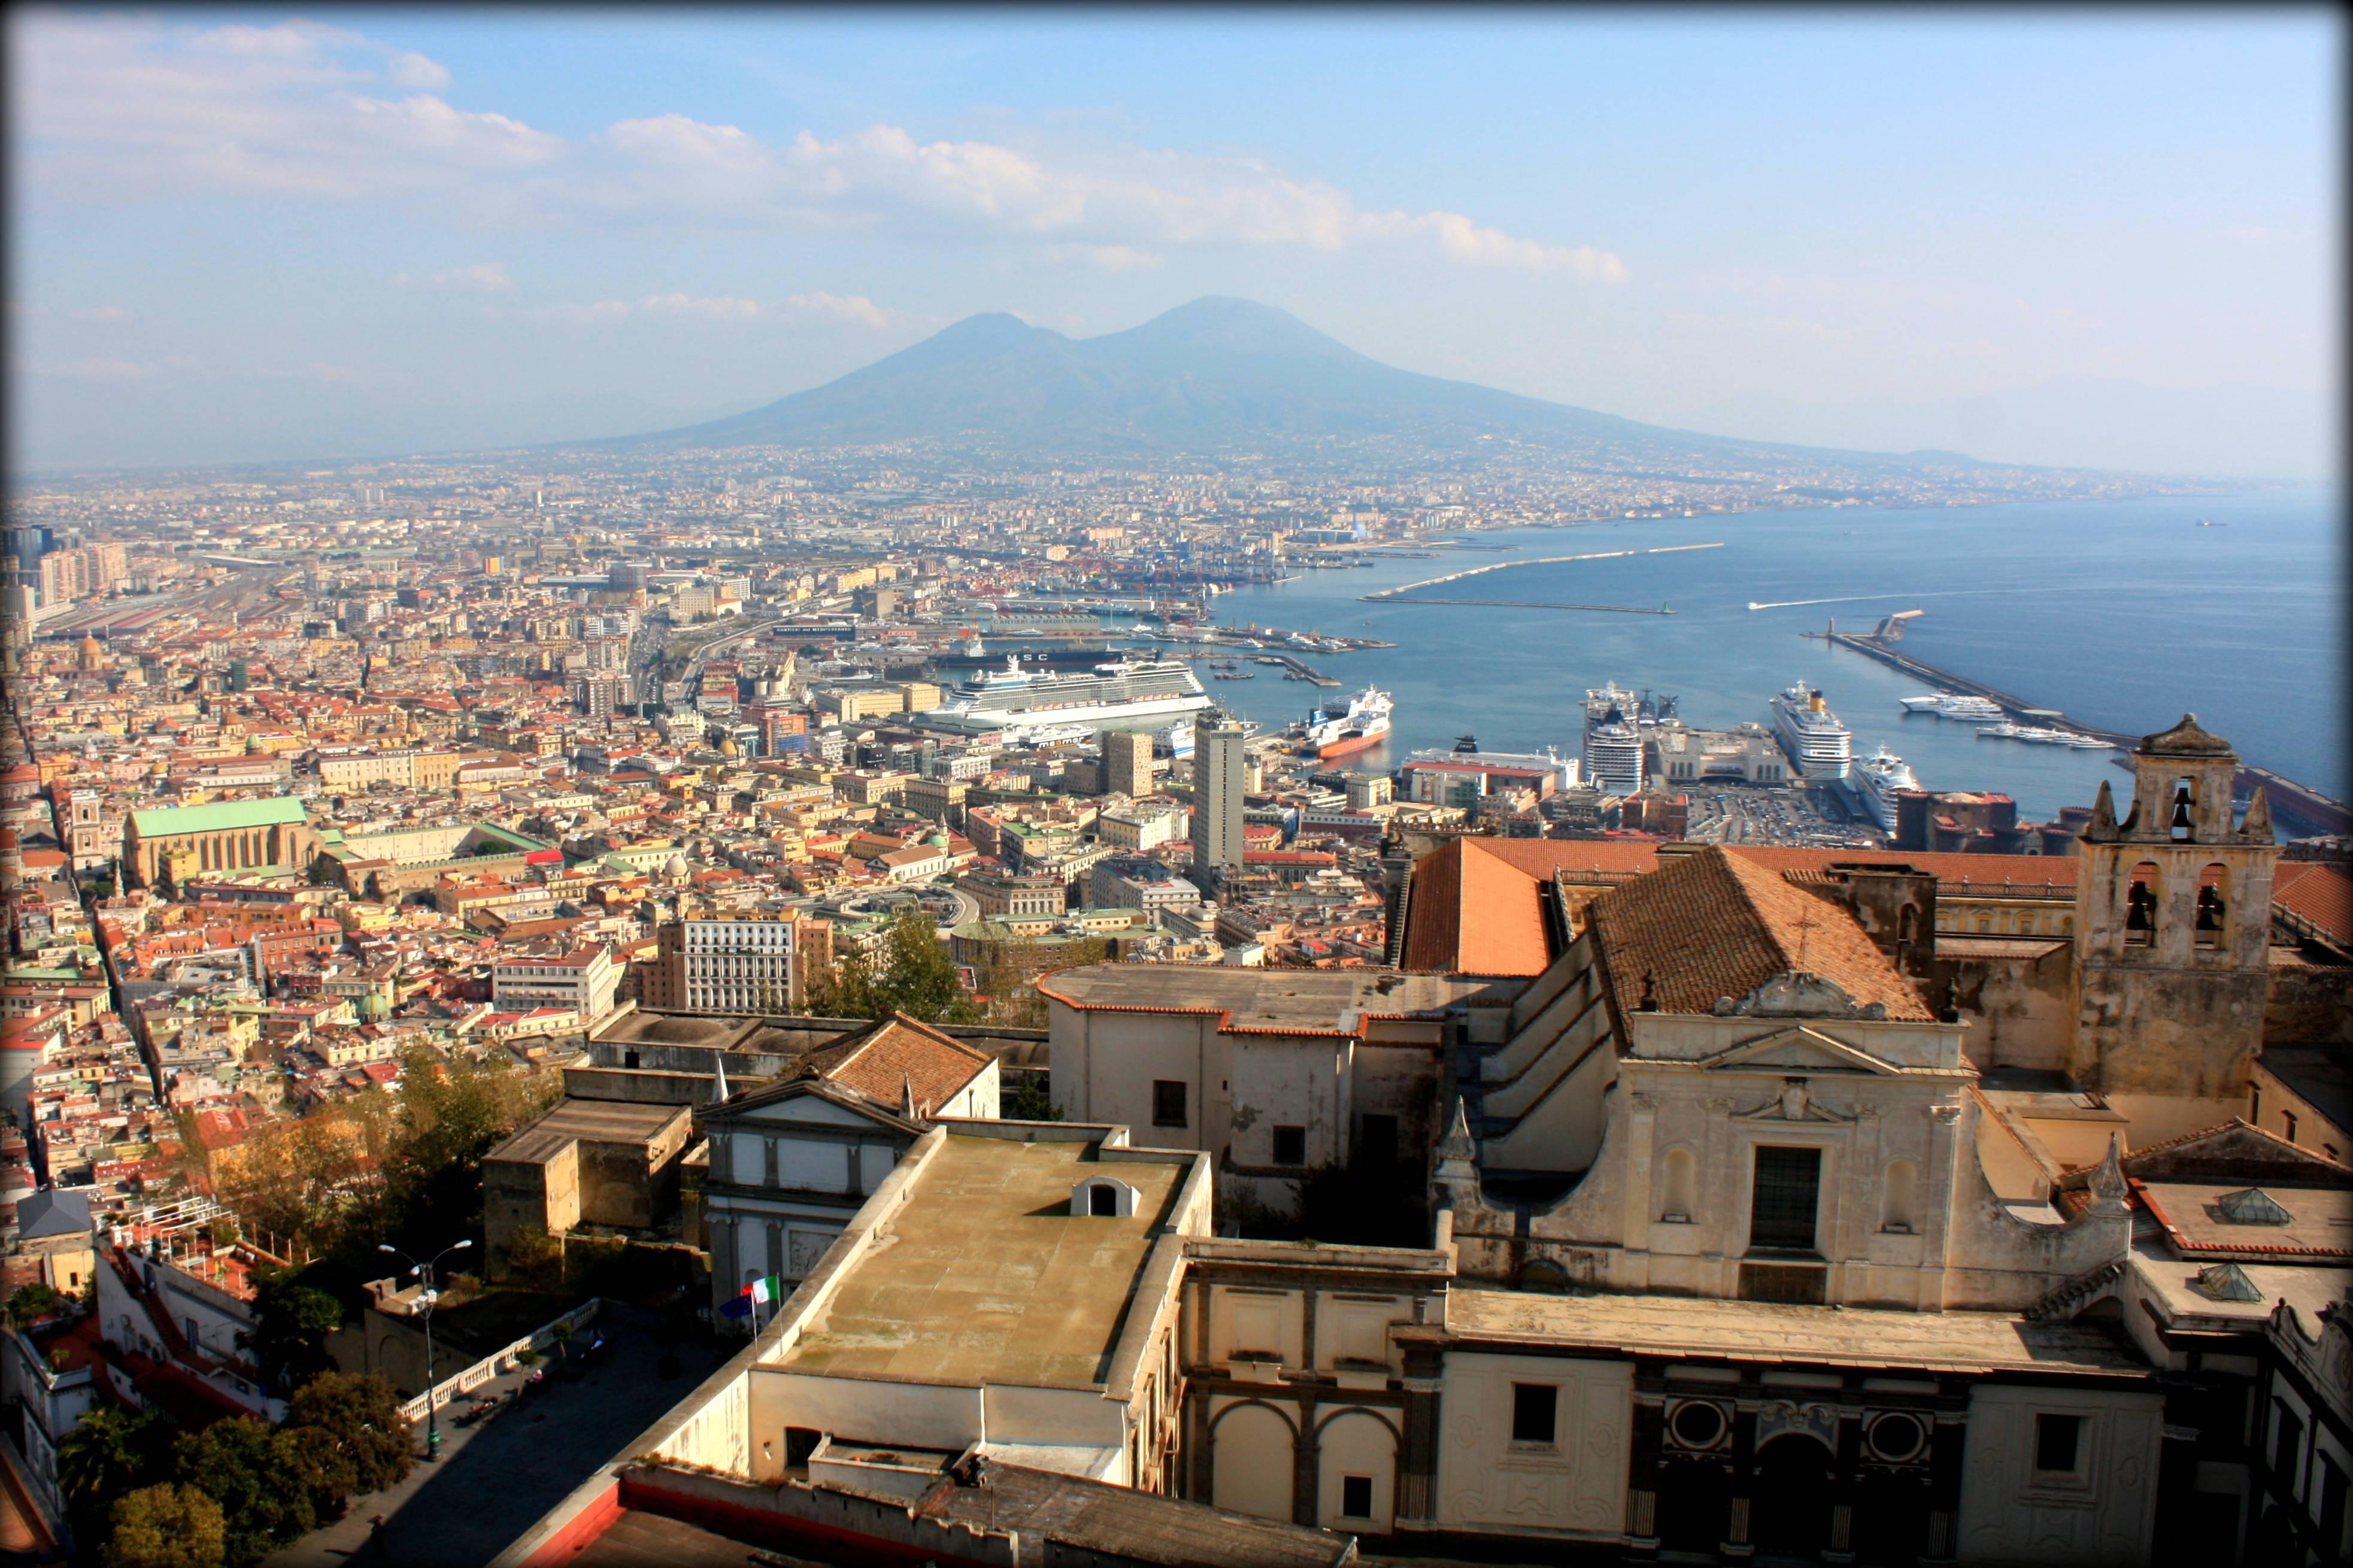 Suicidio a Mergellina: una 22enne si lancia dal balcone di casa